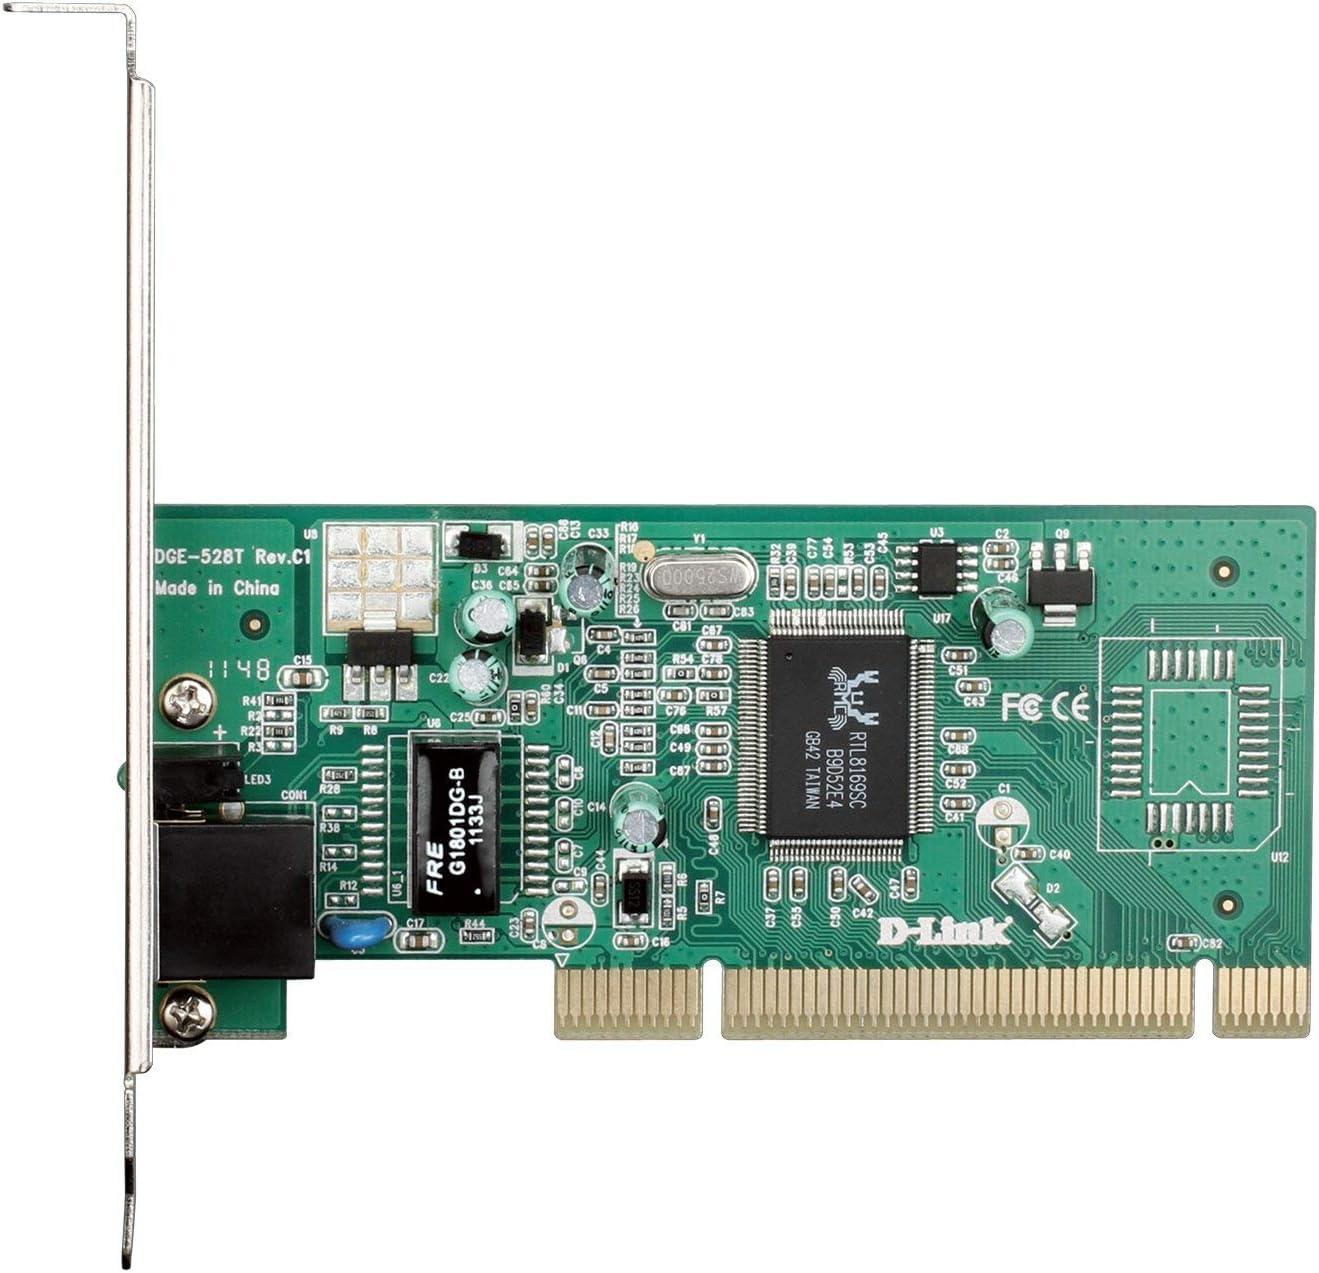 D Link Dge 528t Netzwerkkarte Gigabit Ethernet Adapter Computer Zubehör